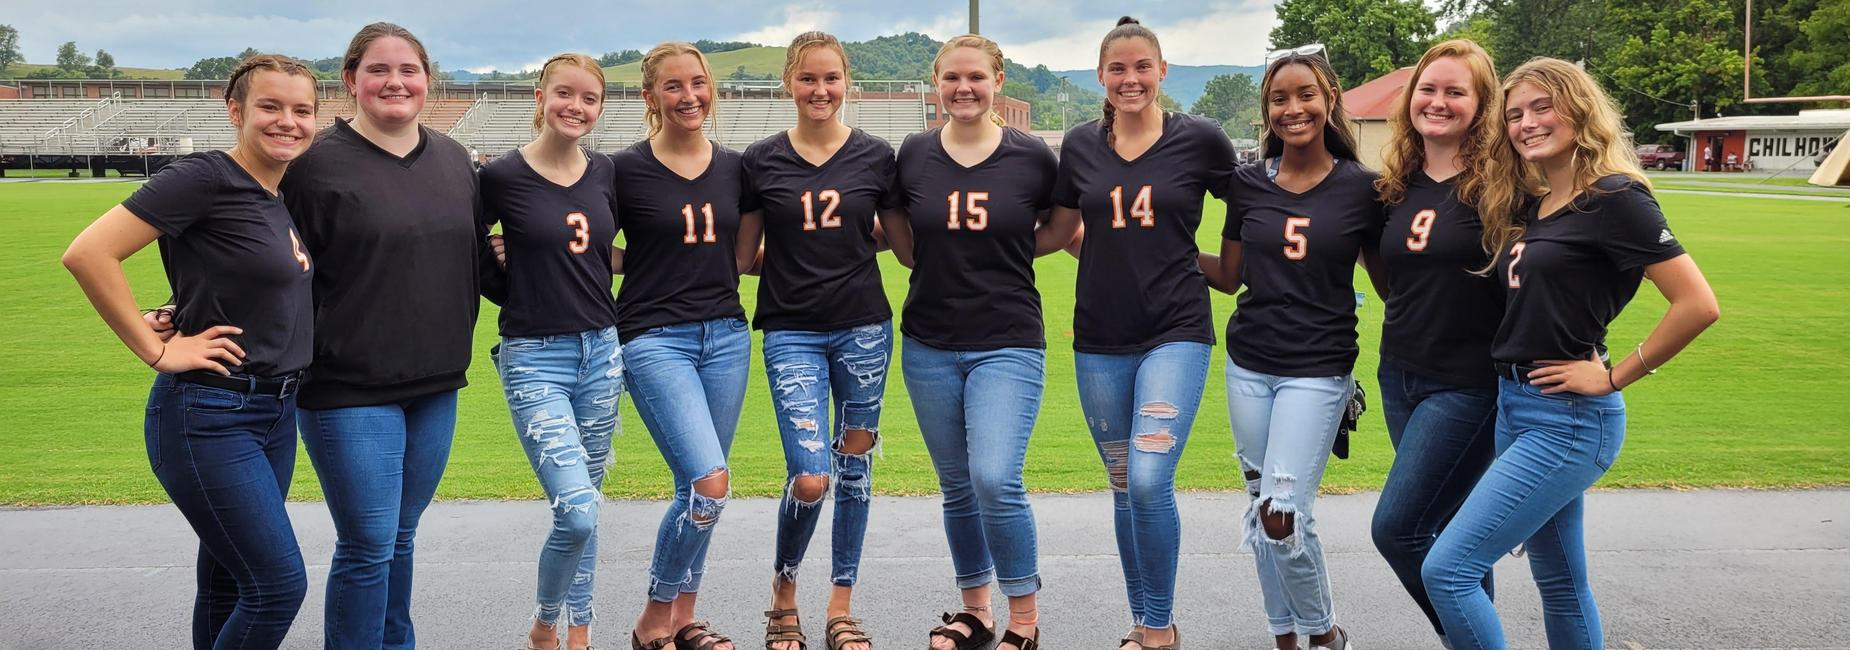 Chilhowie HS Varsity Volleyball Team